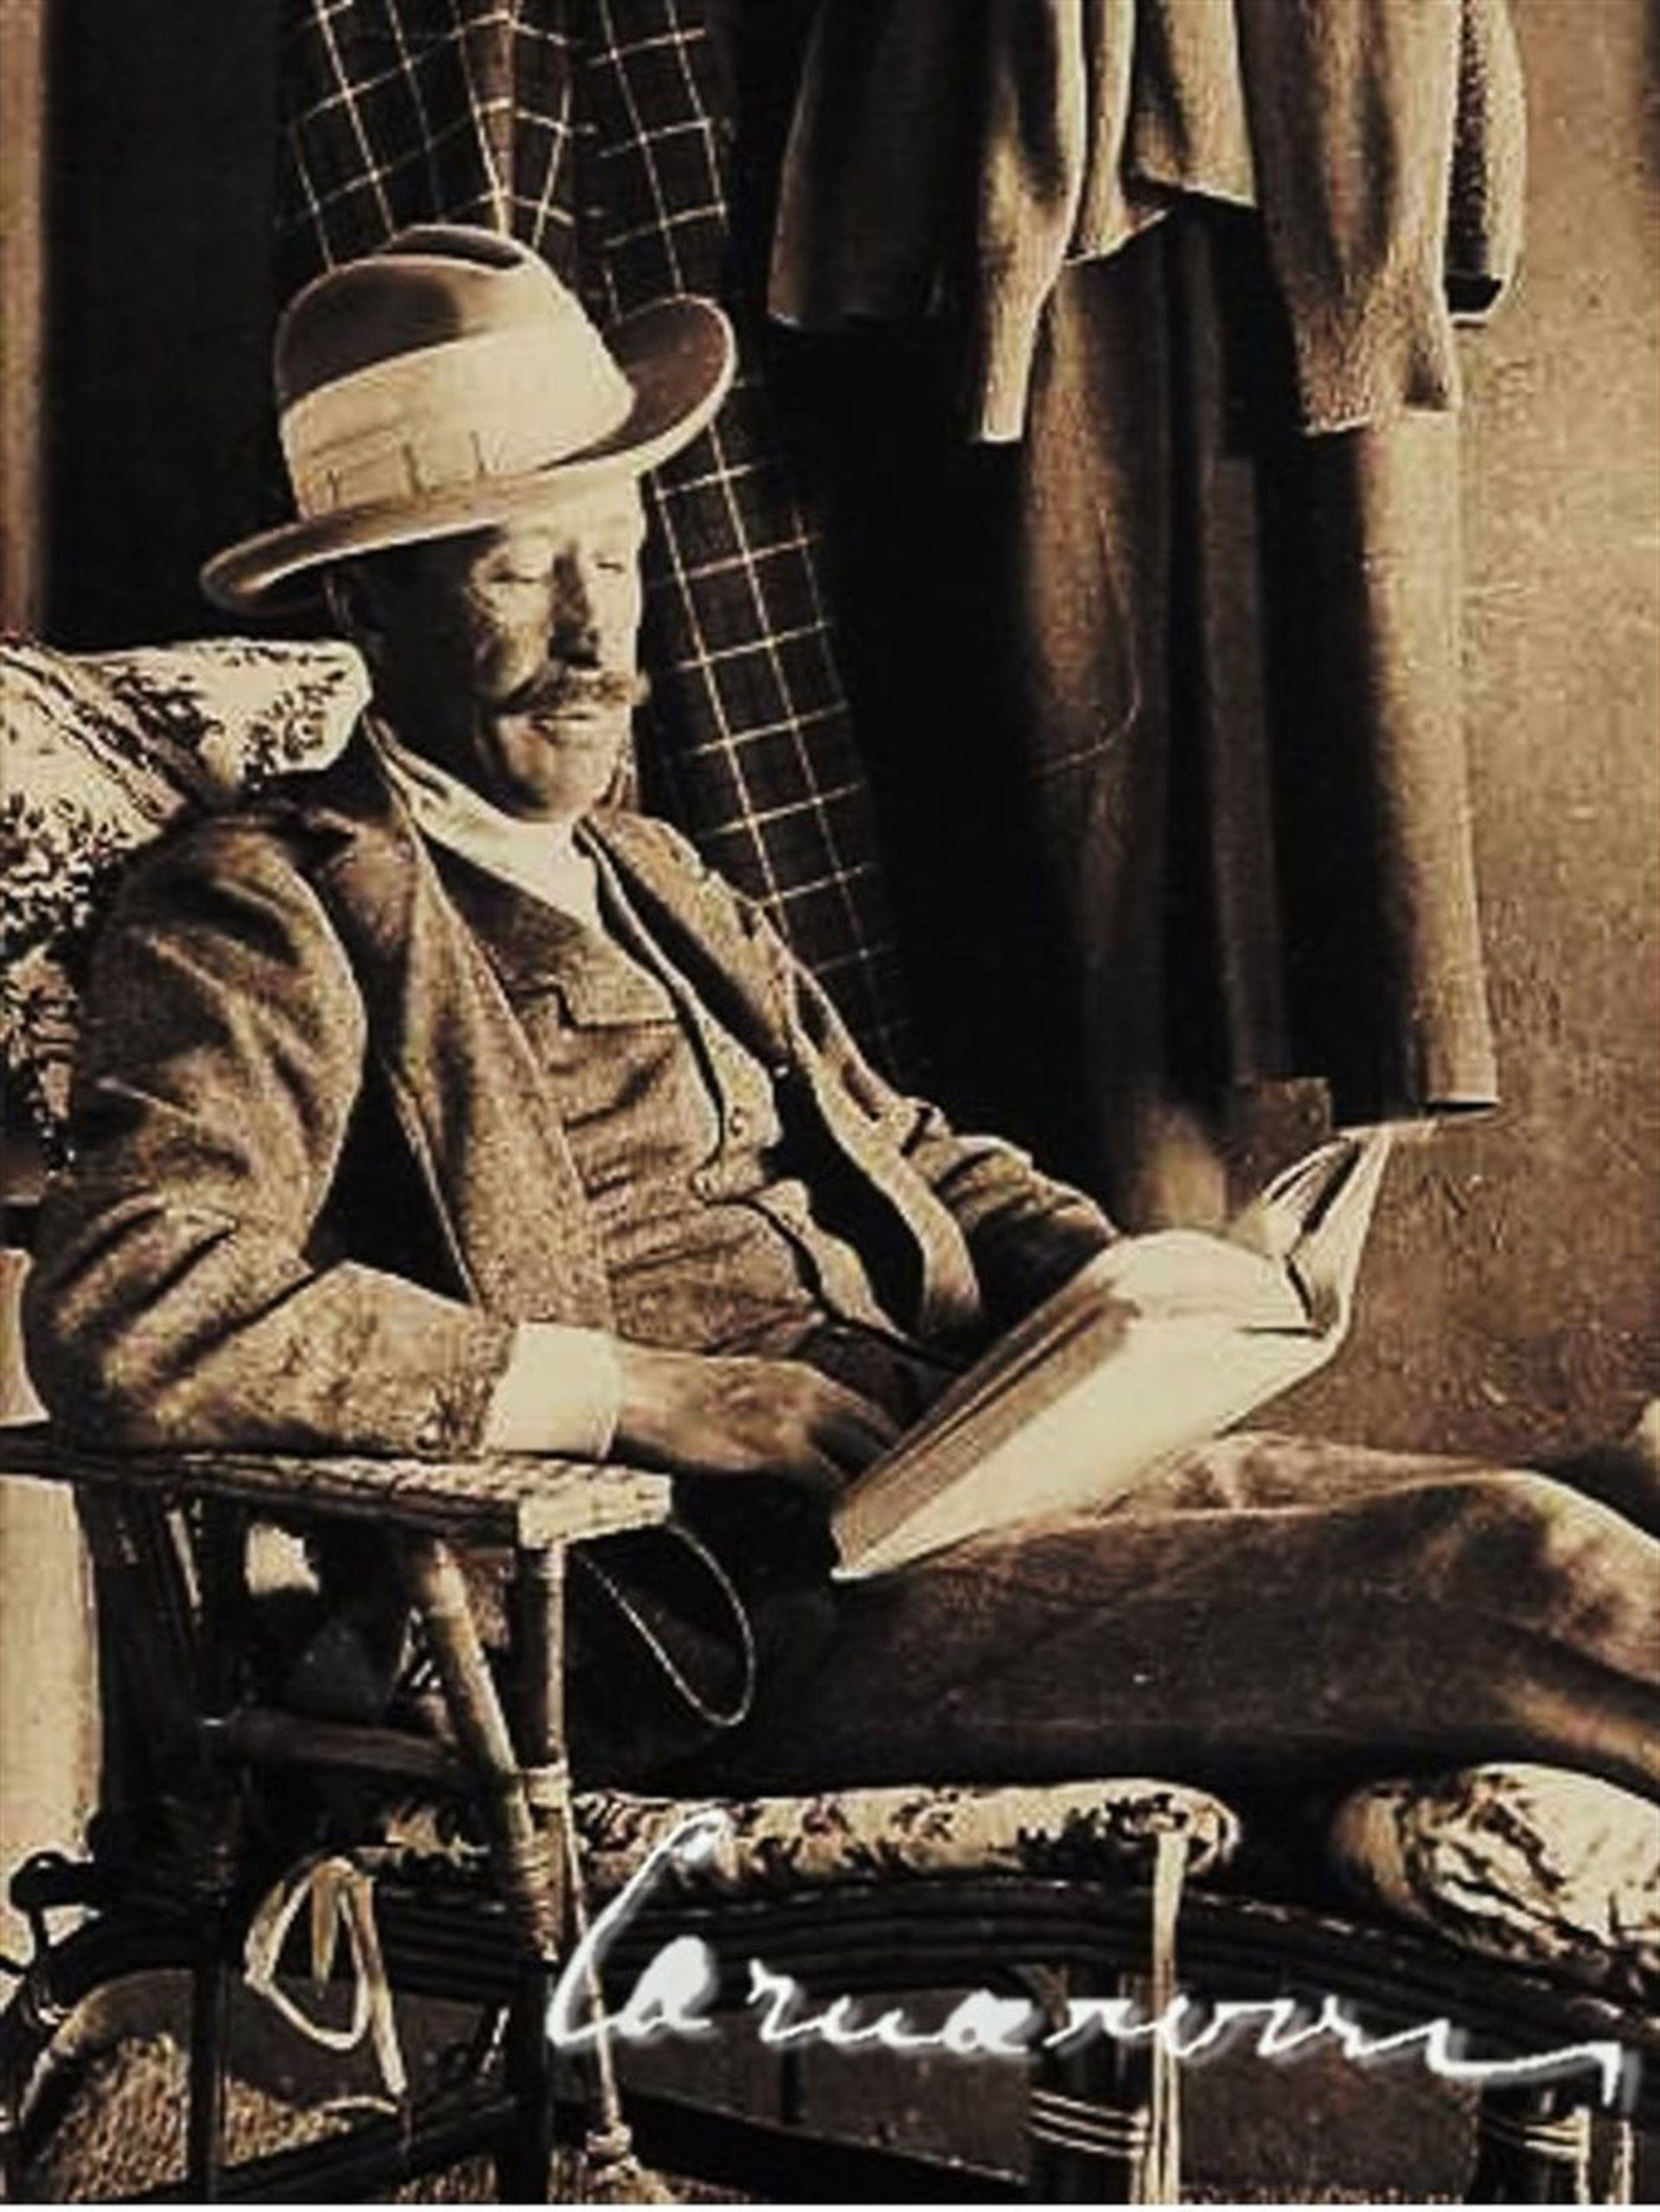 Lord Carnarvon en un momento de lectura